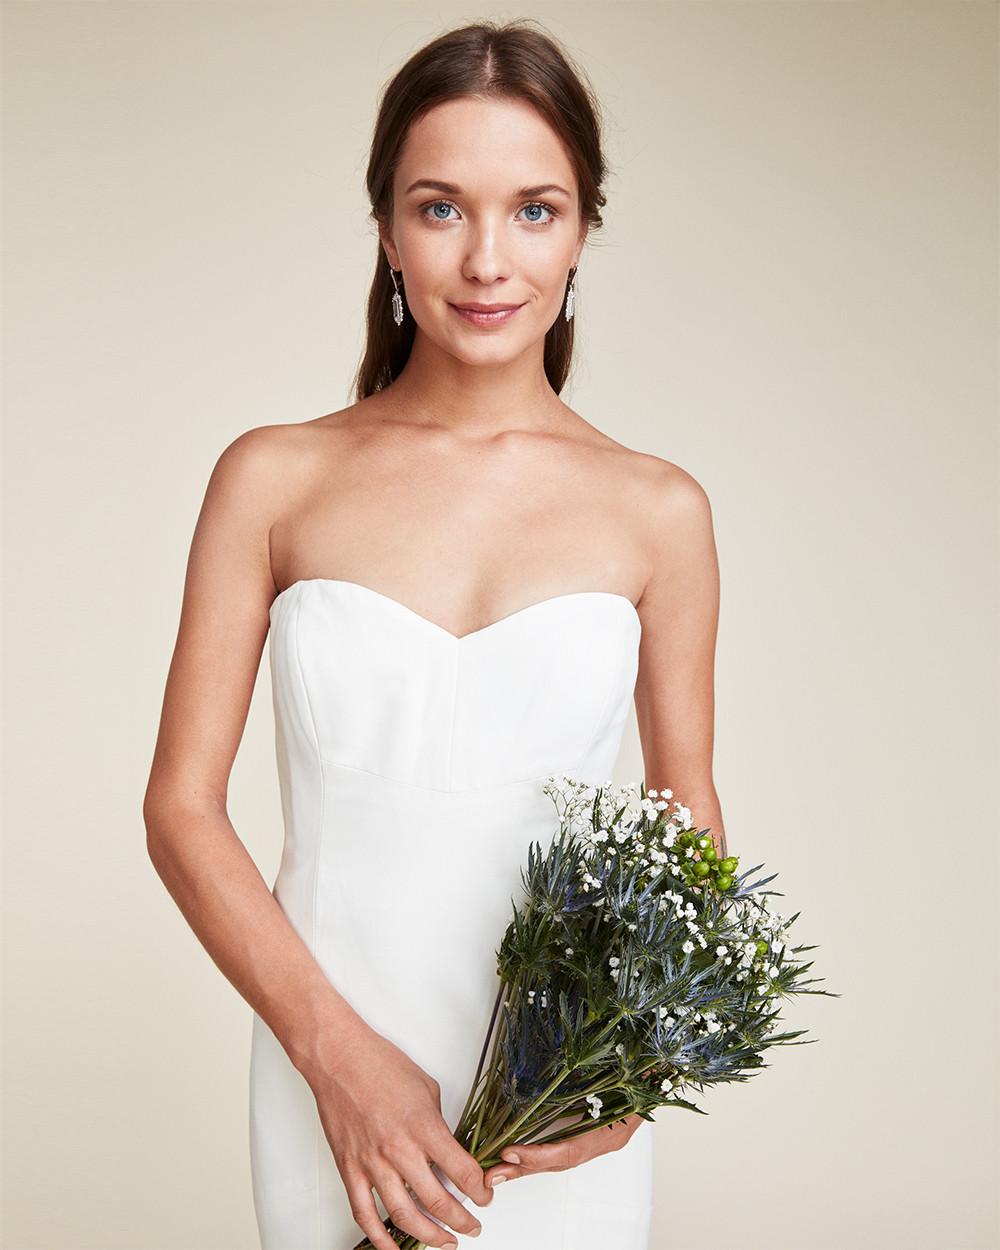 ivory-and-beau-bridal-boutique-zodiac-wedding-style-savannah-wedding-gowns-savannah-wedding-dresses-earnest-loans-2.jpg